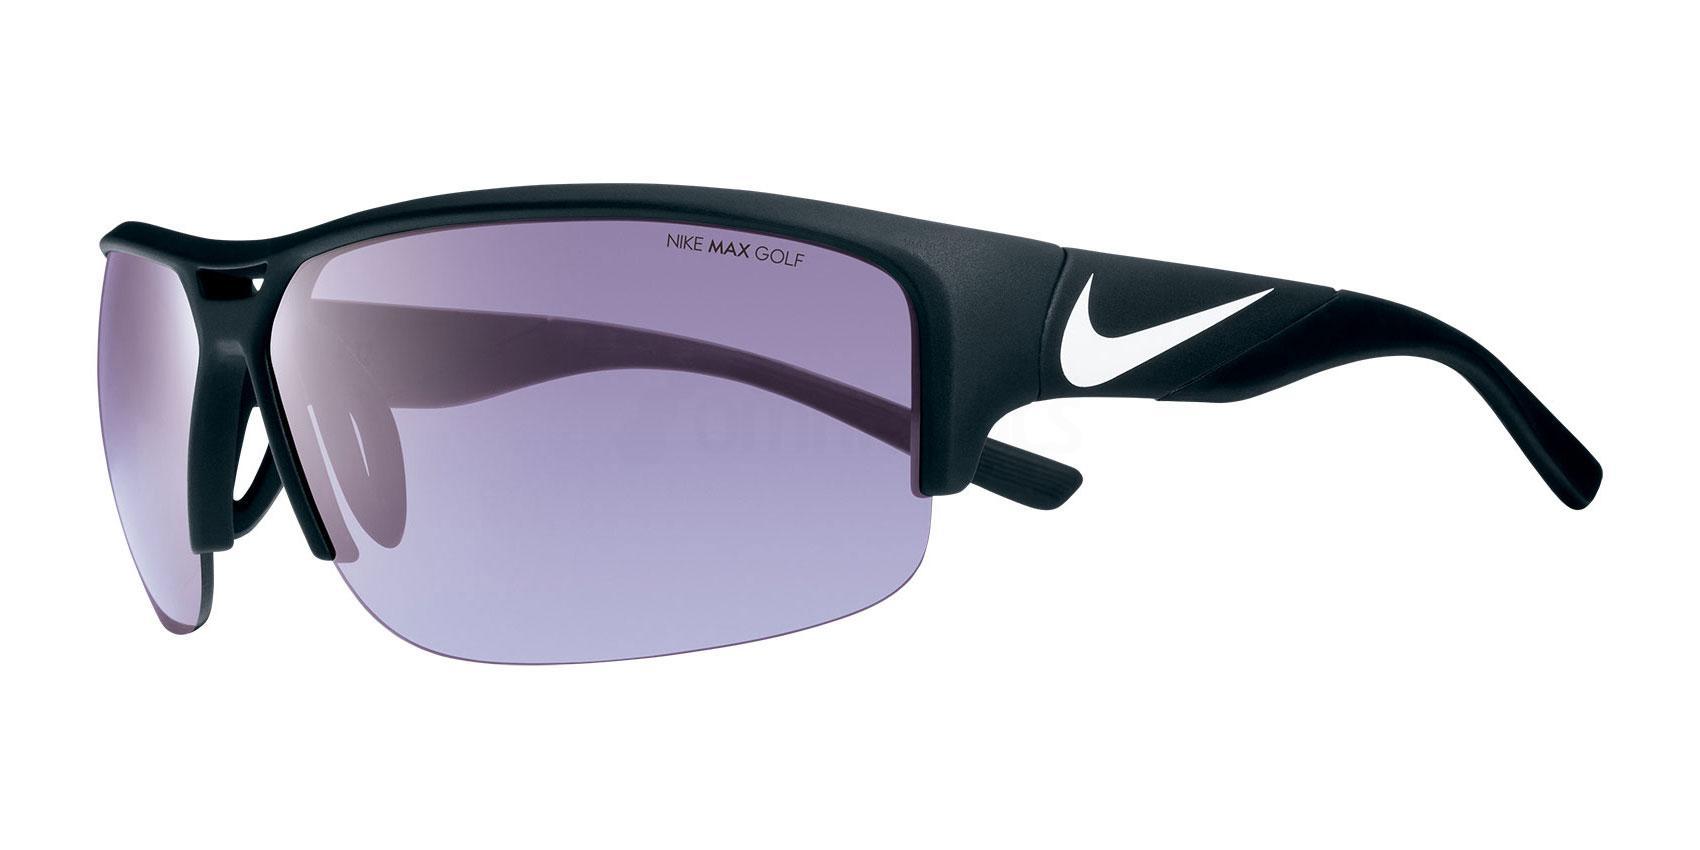 010 NIKE GOLF X2 E EV0871 , Nike